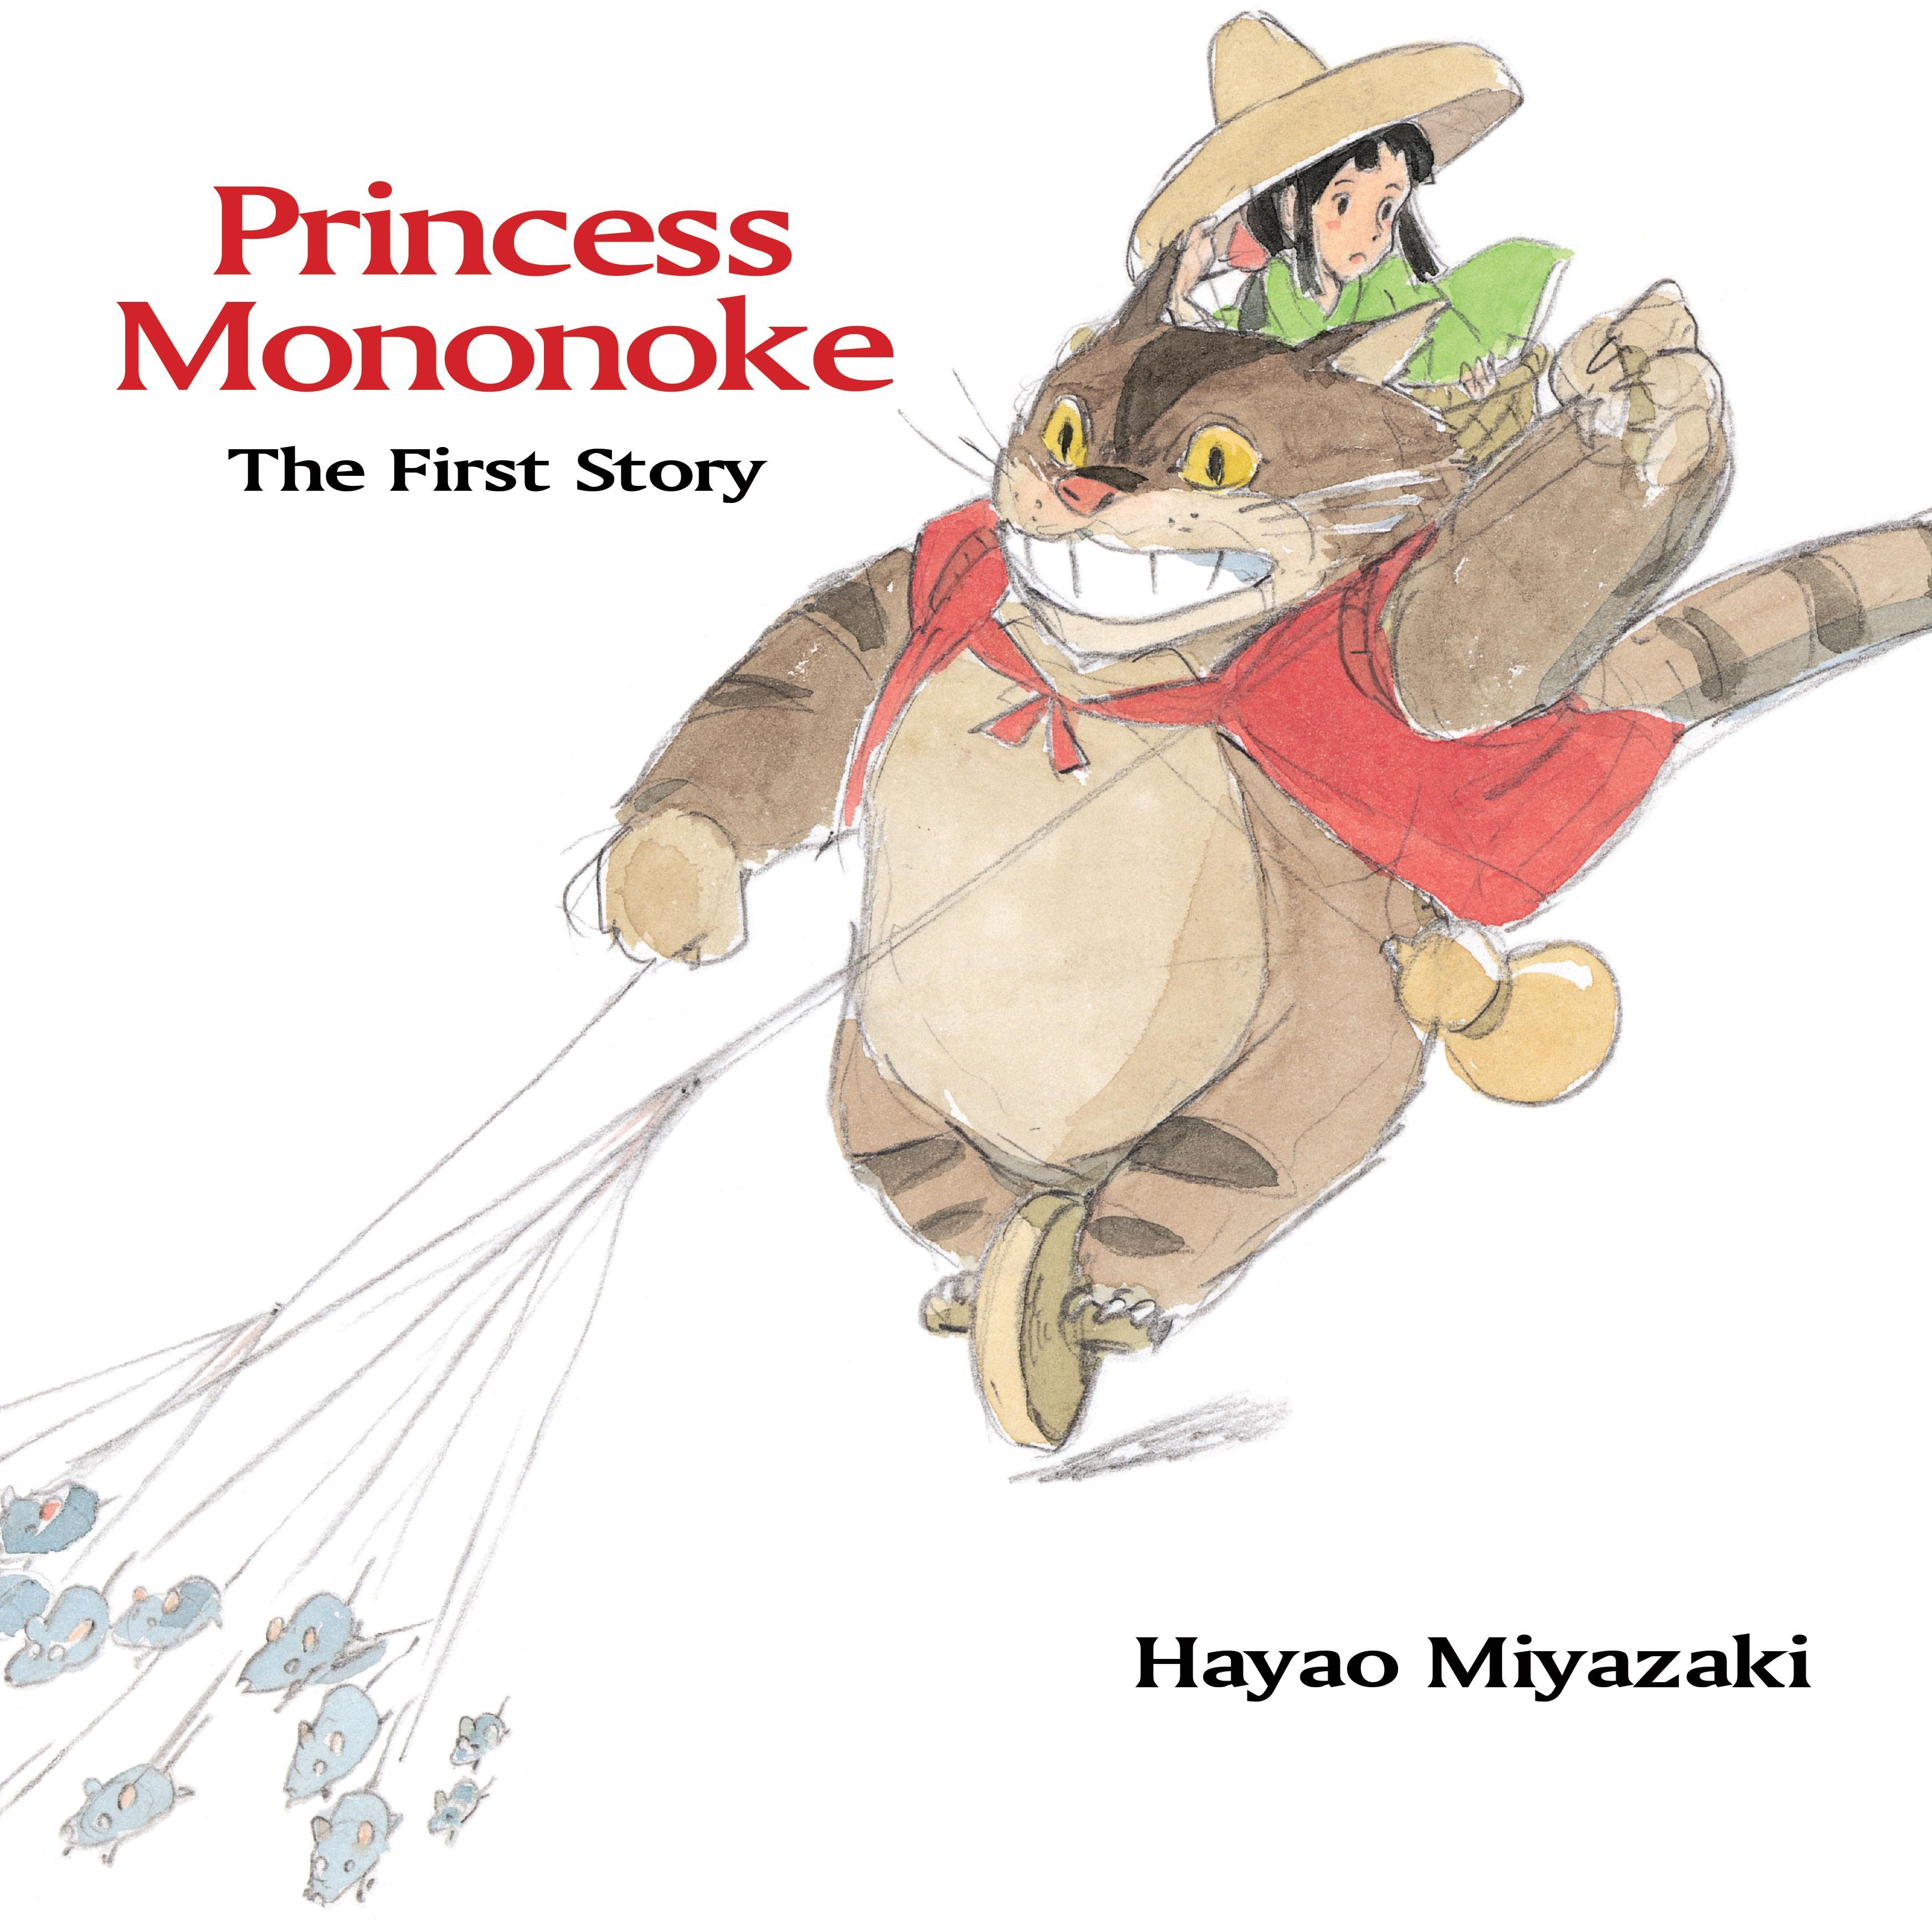 Princess Mononoke The First Story by Hayao Miyazaki